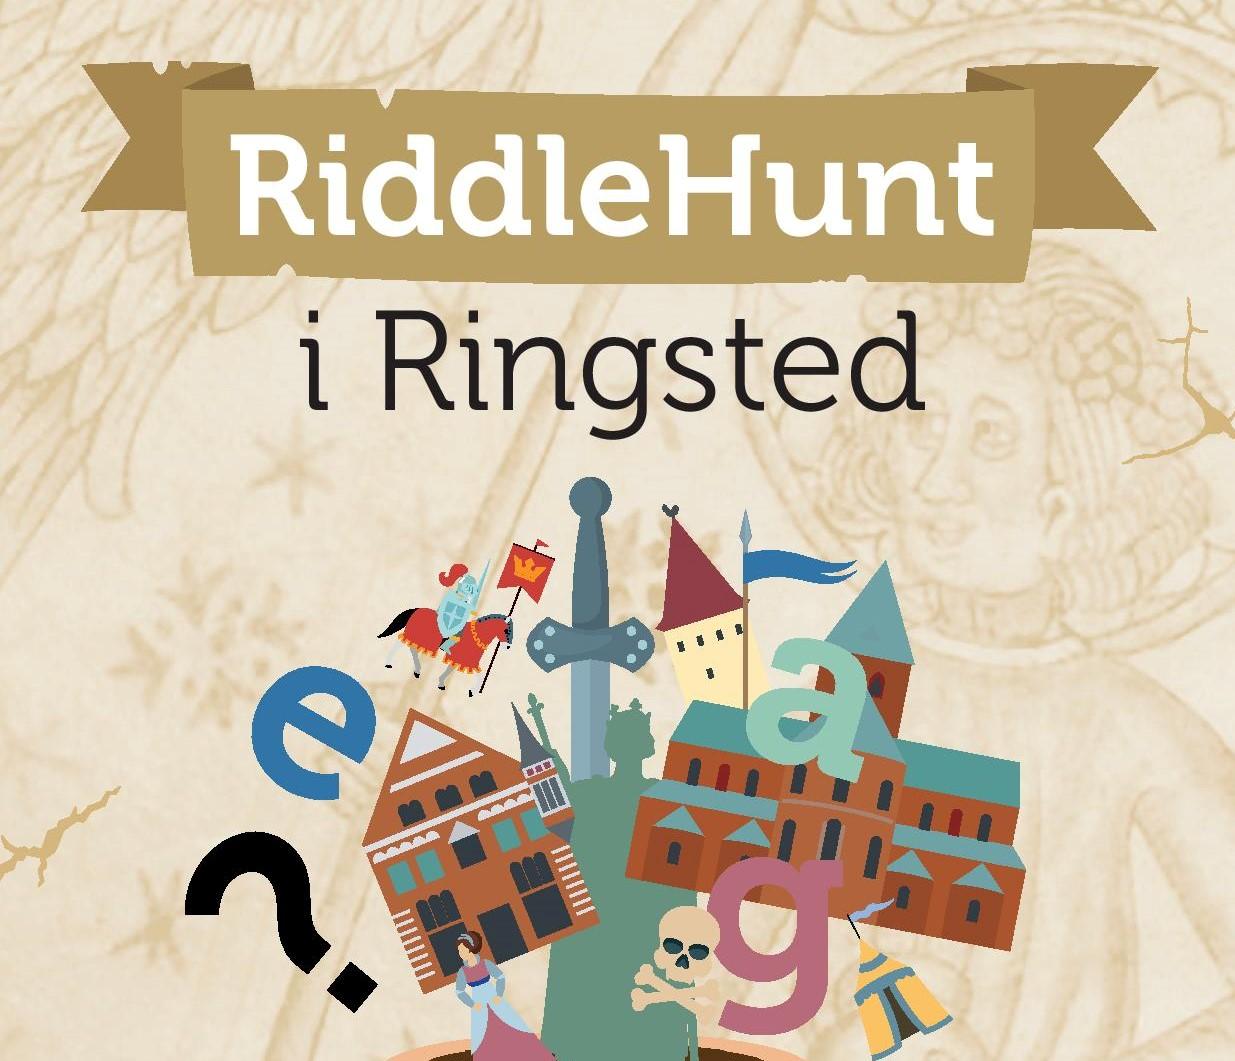 Tag på byvandring med RiddleHunt i Ringsted